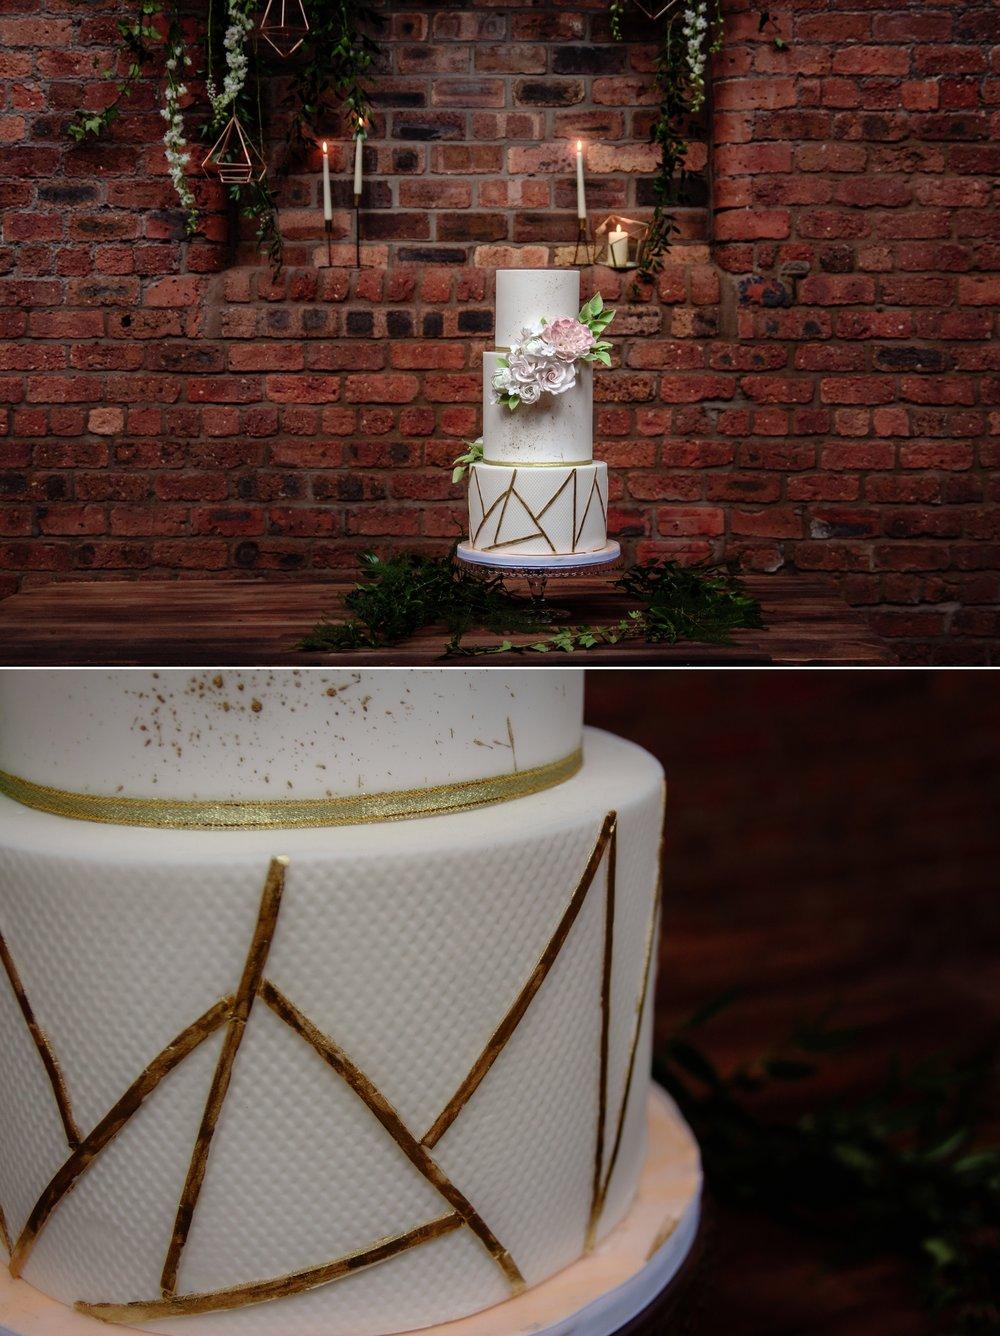 engine-works-wedding-styled-shoot-fotomaki-photography-83.jpg